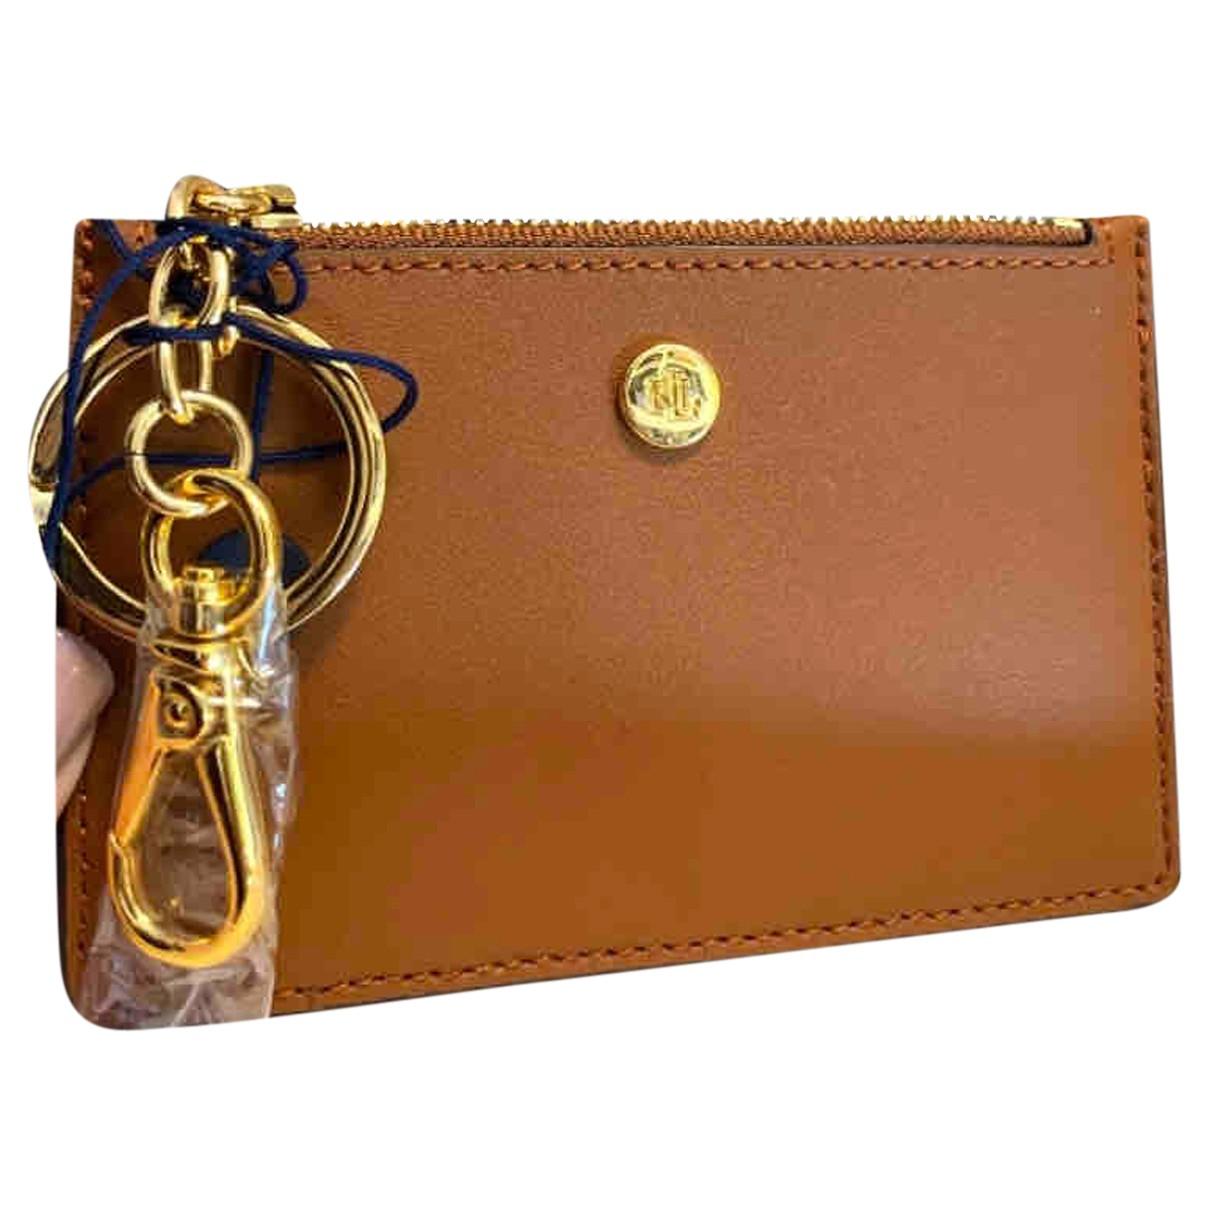 Polo Ralph Lauren N Brown Leather wallet for Women N